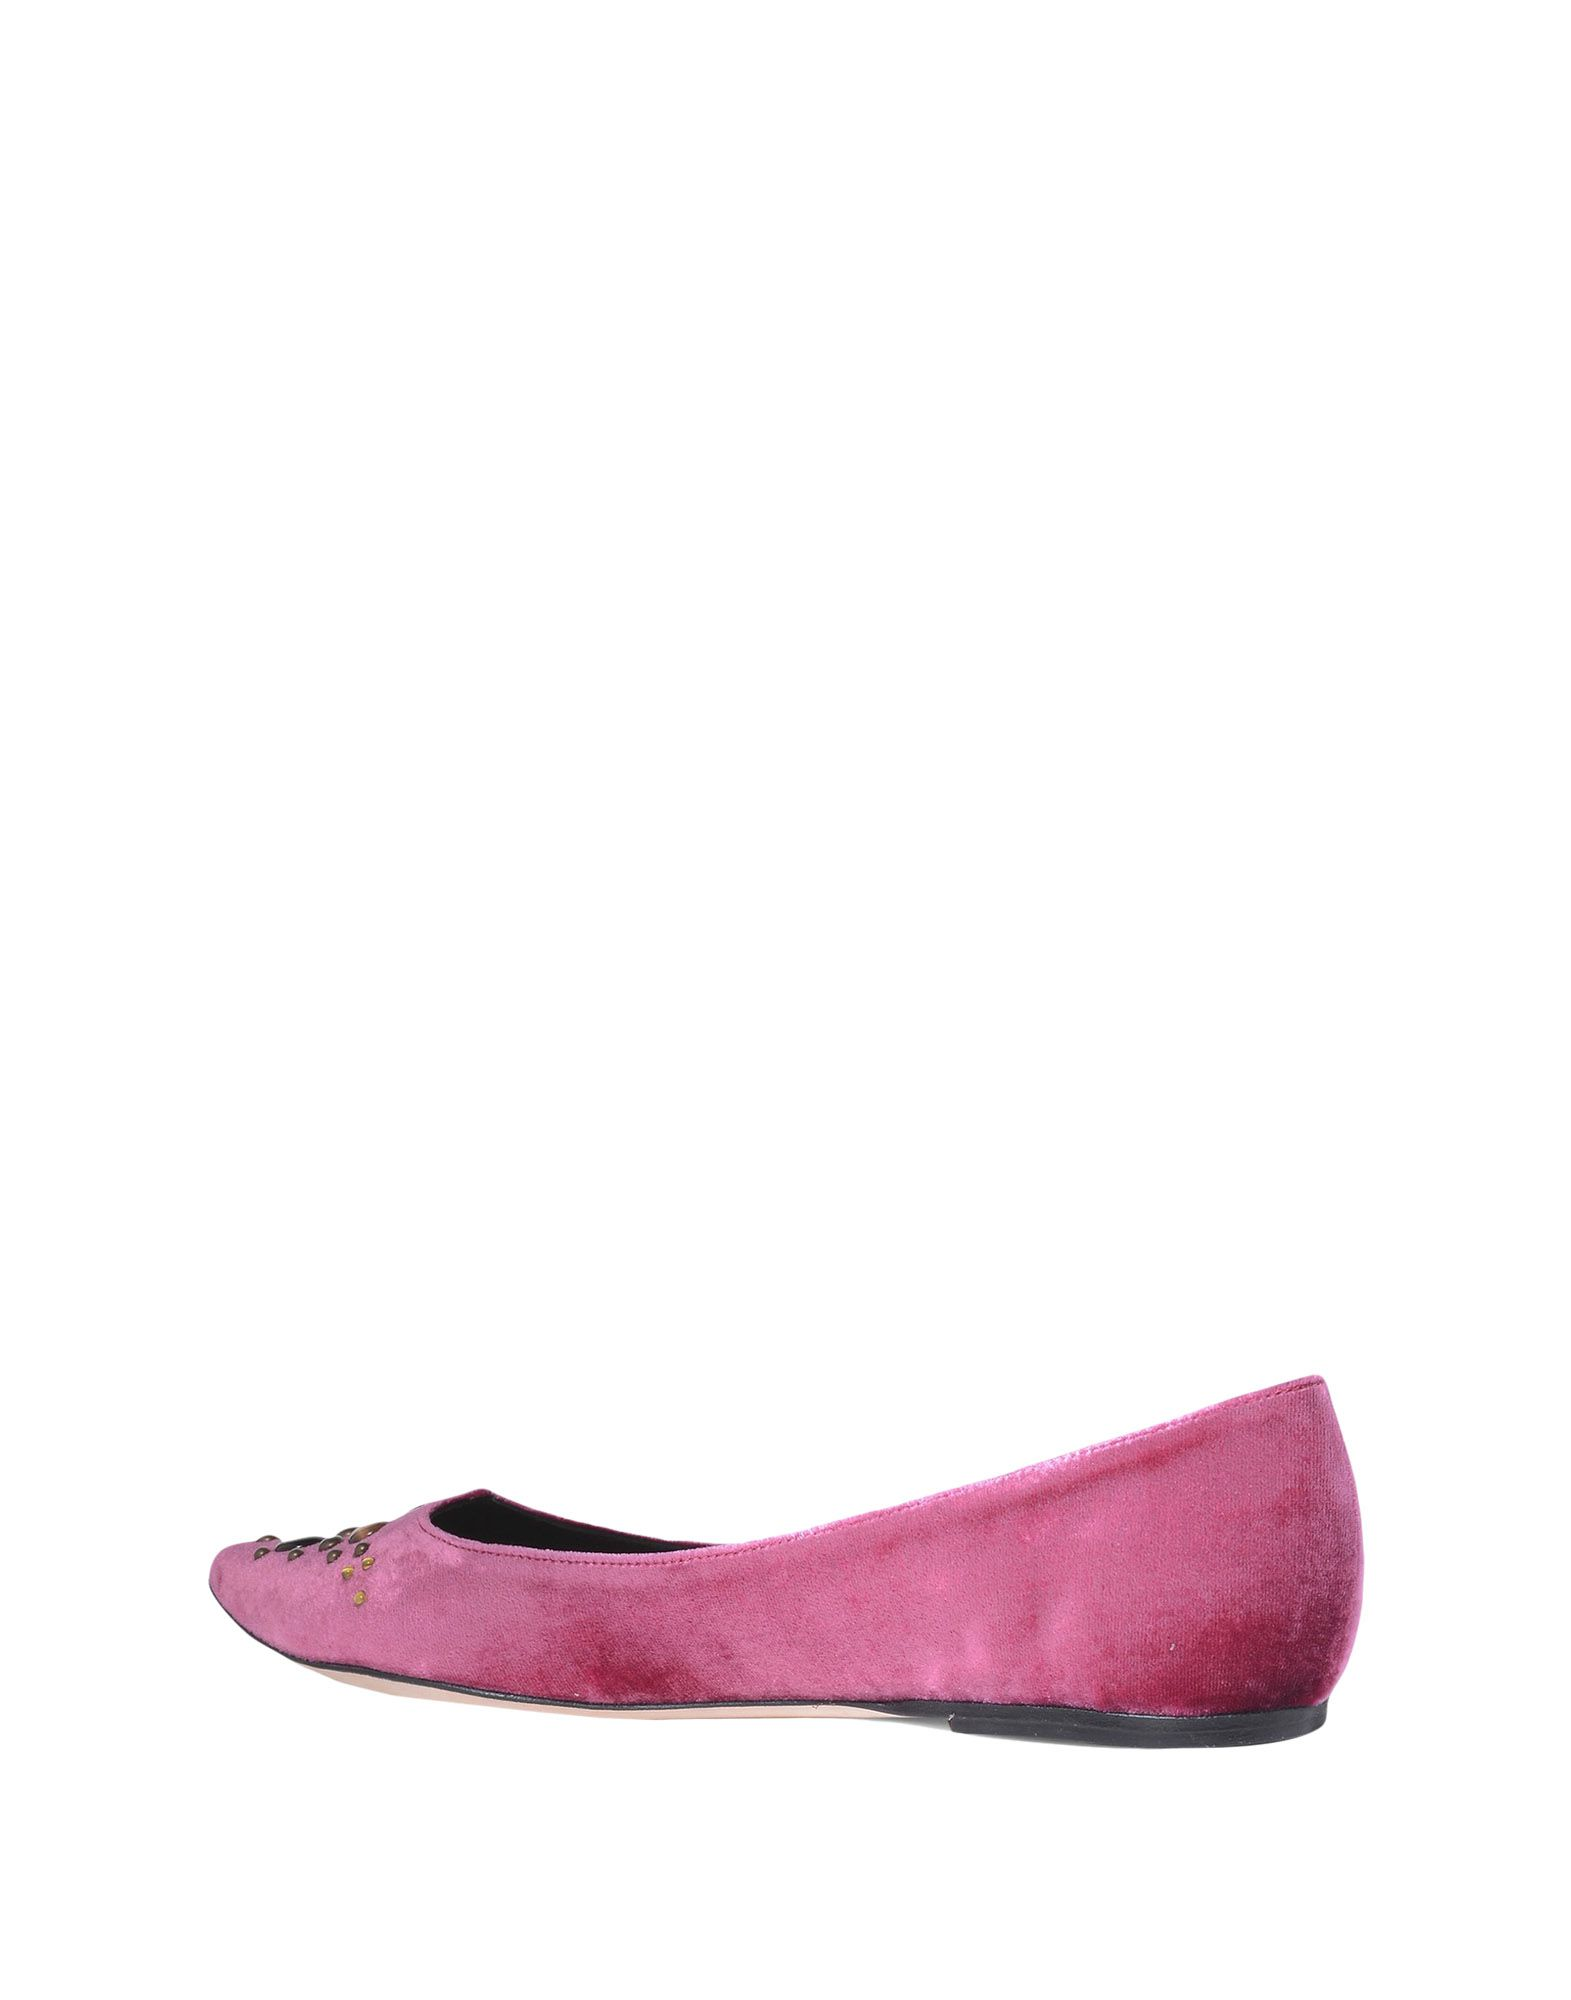 Stilvolle billige Schuhe Tomas Maier Ballerinas Damen  11394594QU